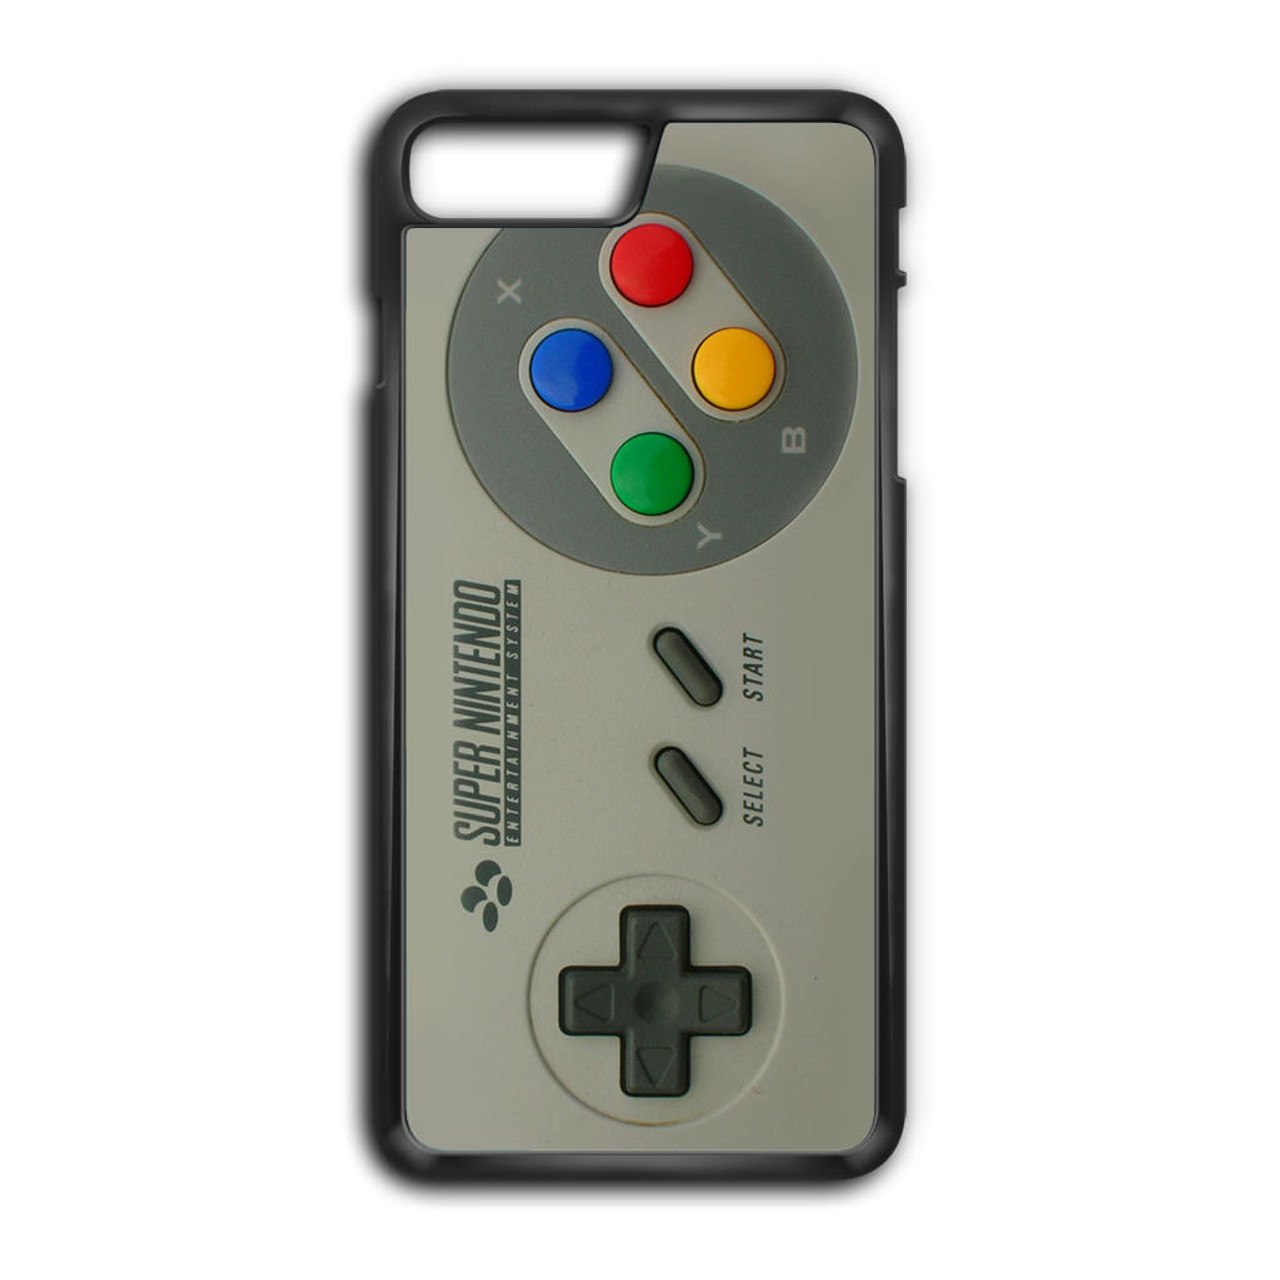 quality design 0429e a4336 SNES Controller iPhone 7 Plus Case